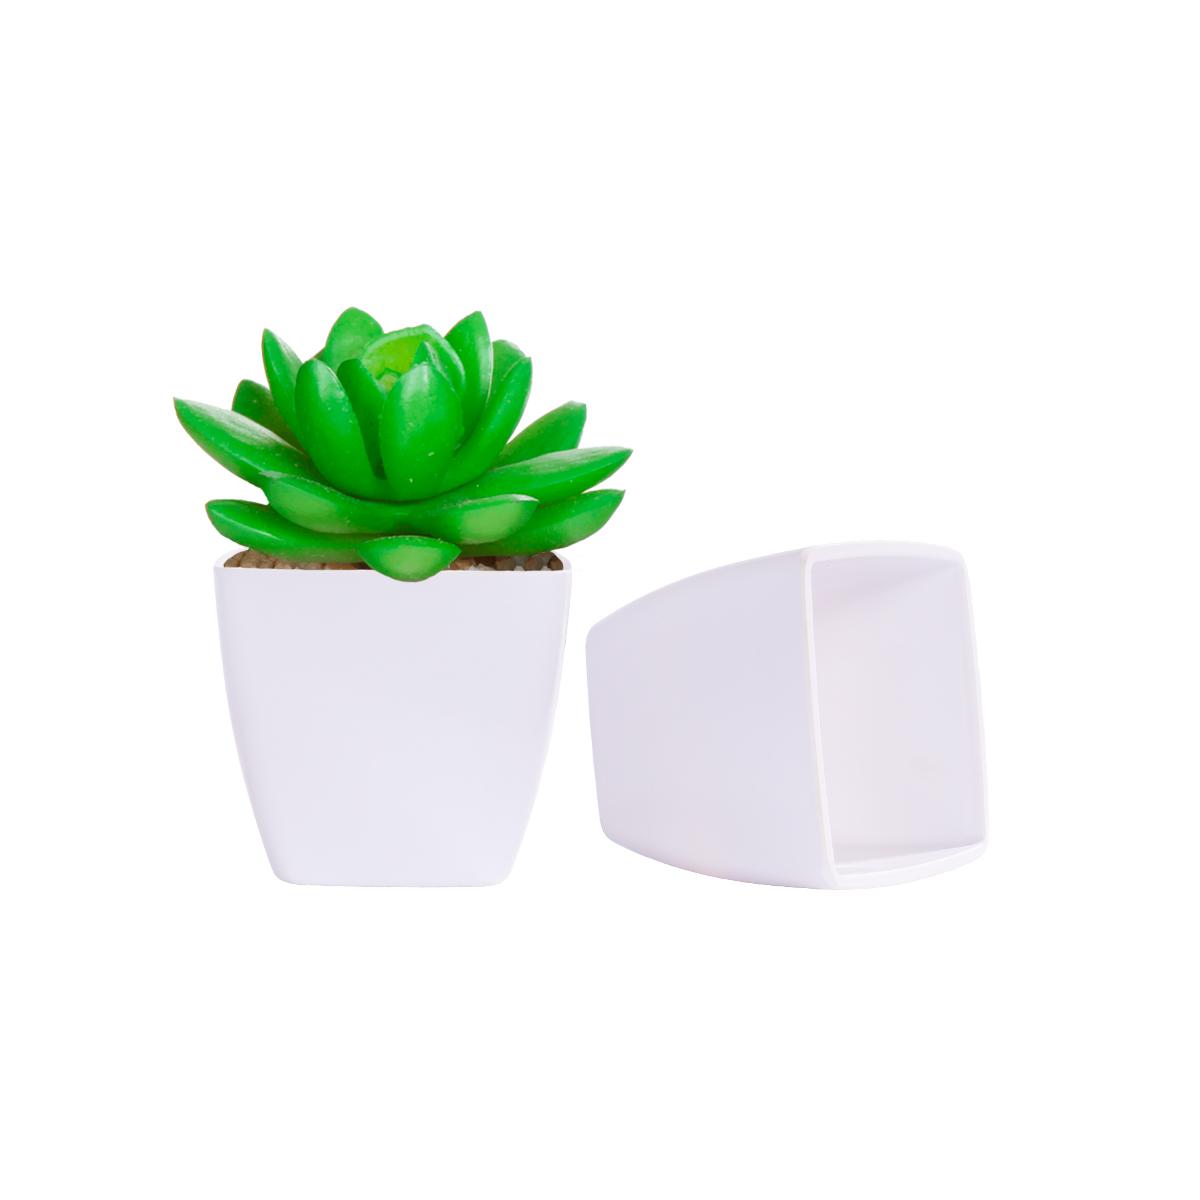 Vaso Decorativo Melamina Quadrado Branco 9,5x9,5x8,5cm